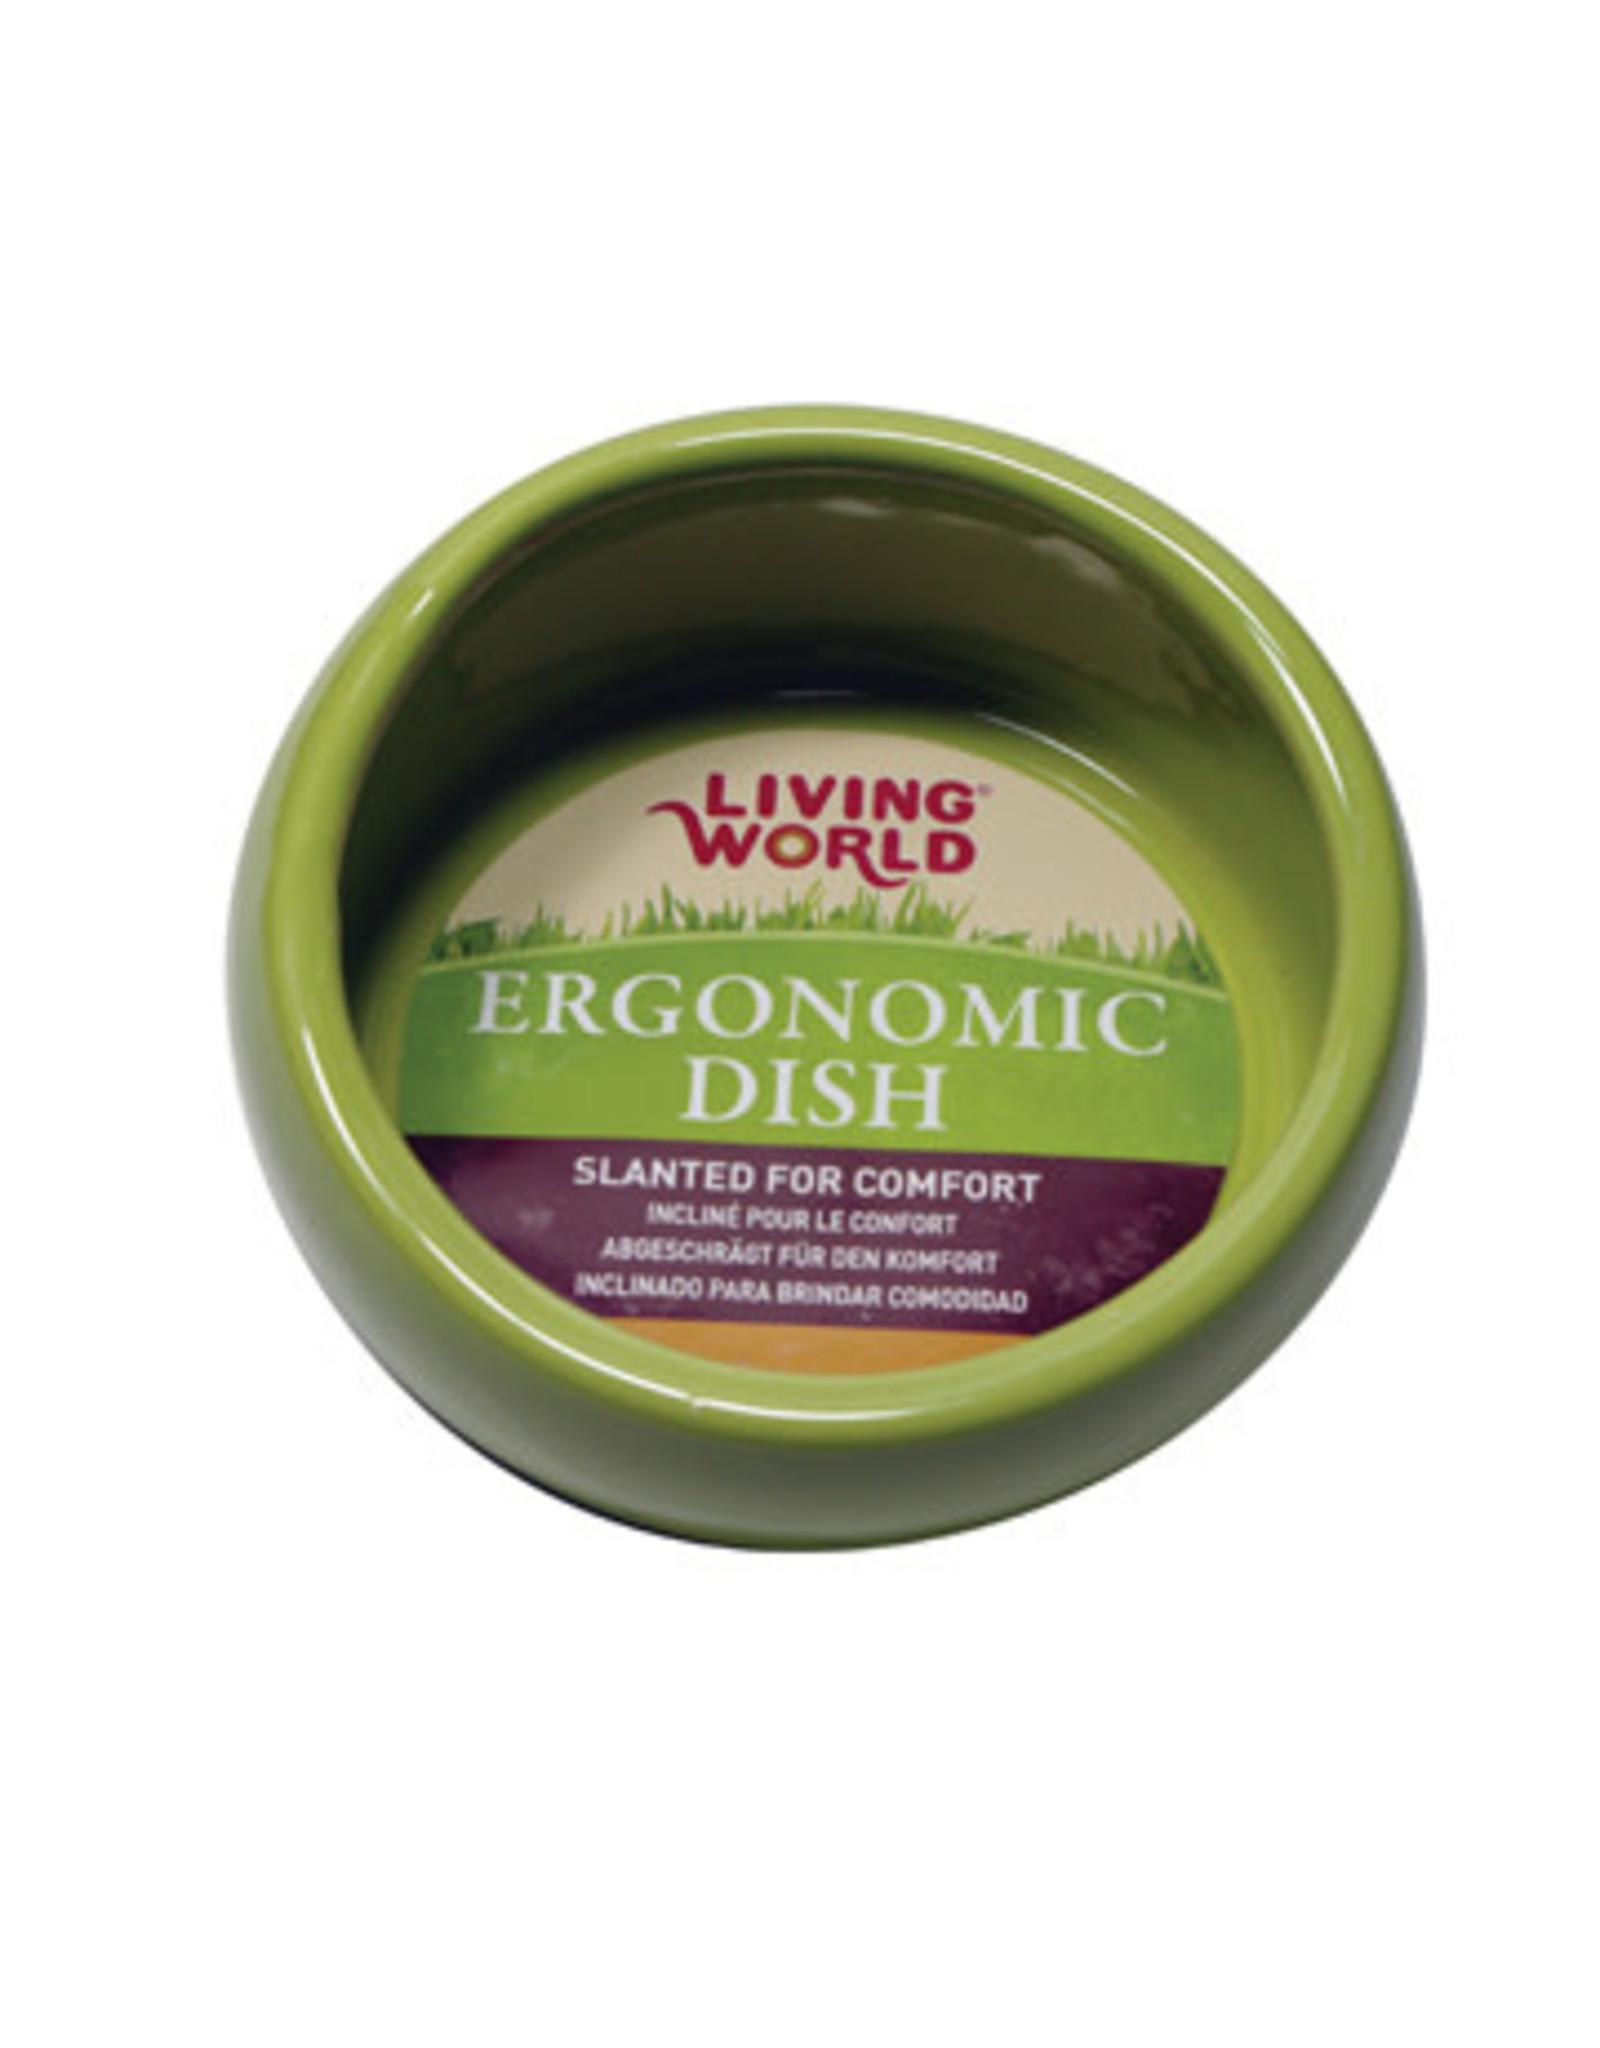 Living World Ergonomic Dish - Large - 420 mL (14.78 oz) - Green/Ceramic